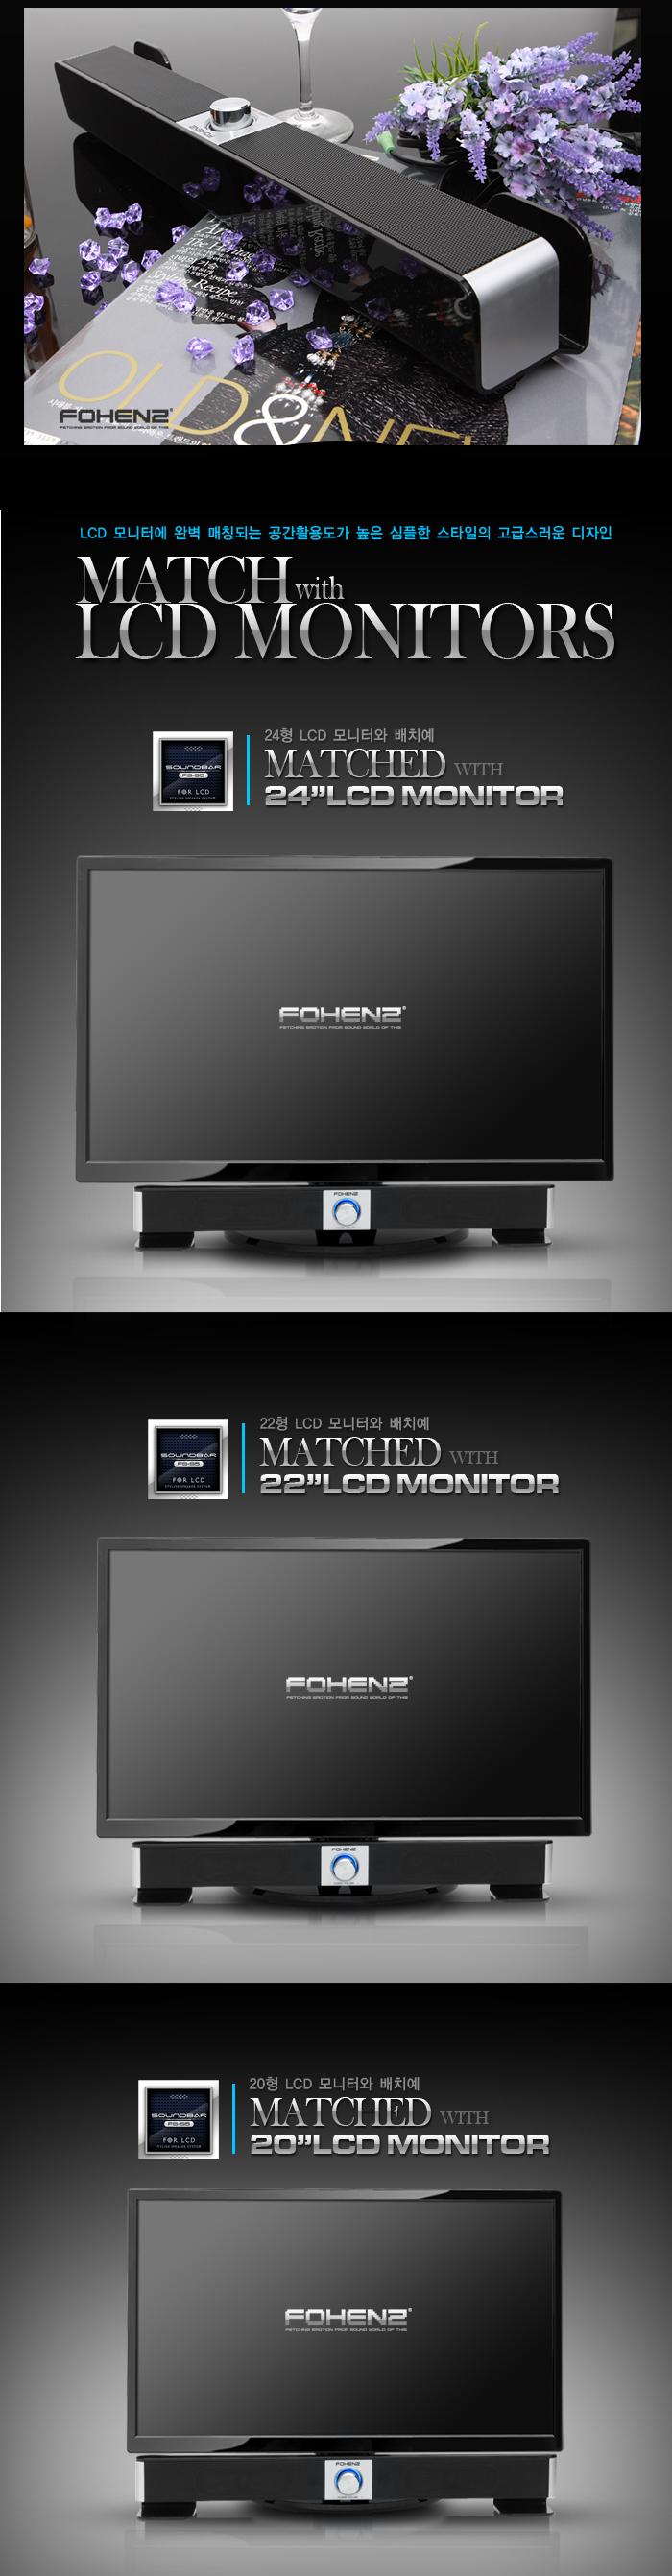 Power Monitoring Software : Pc power monitoring software lovingeye nensiona